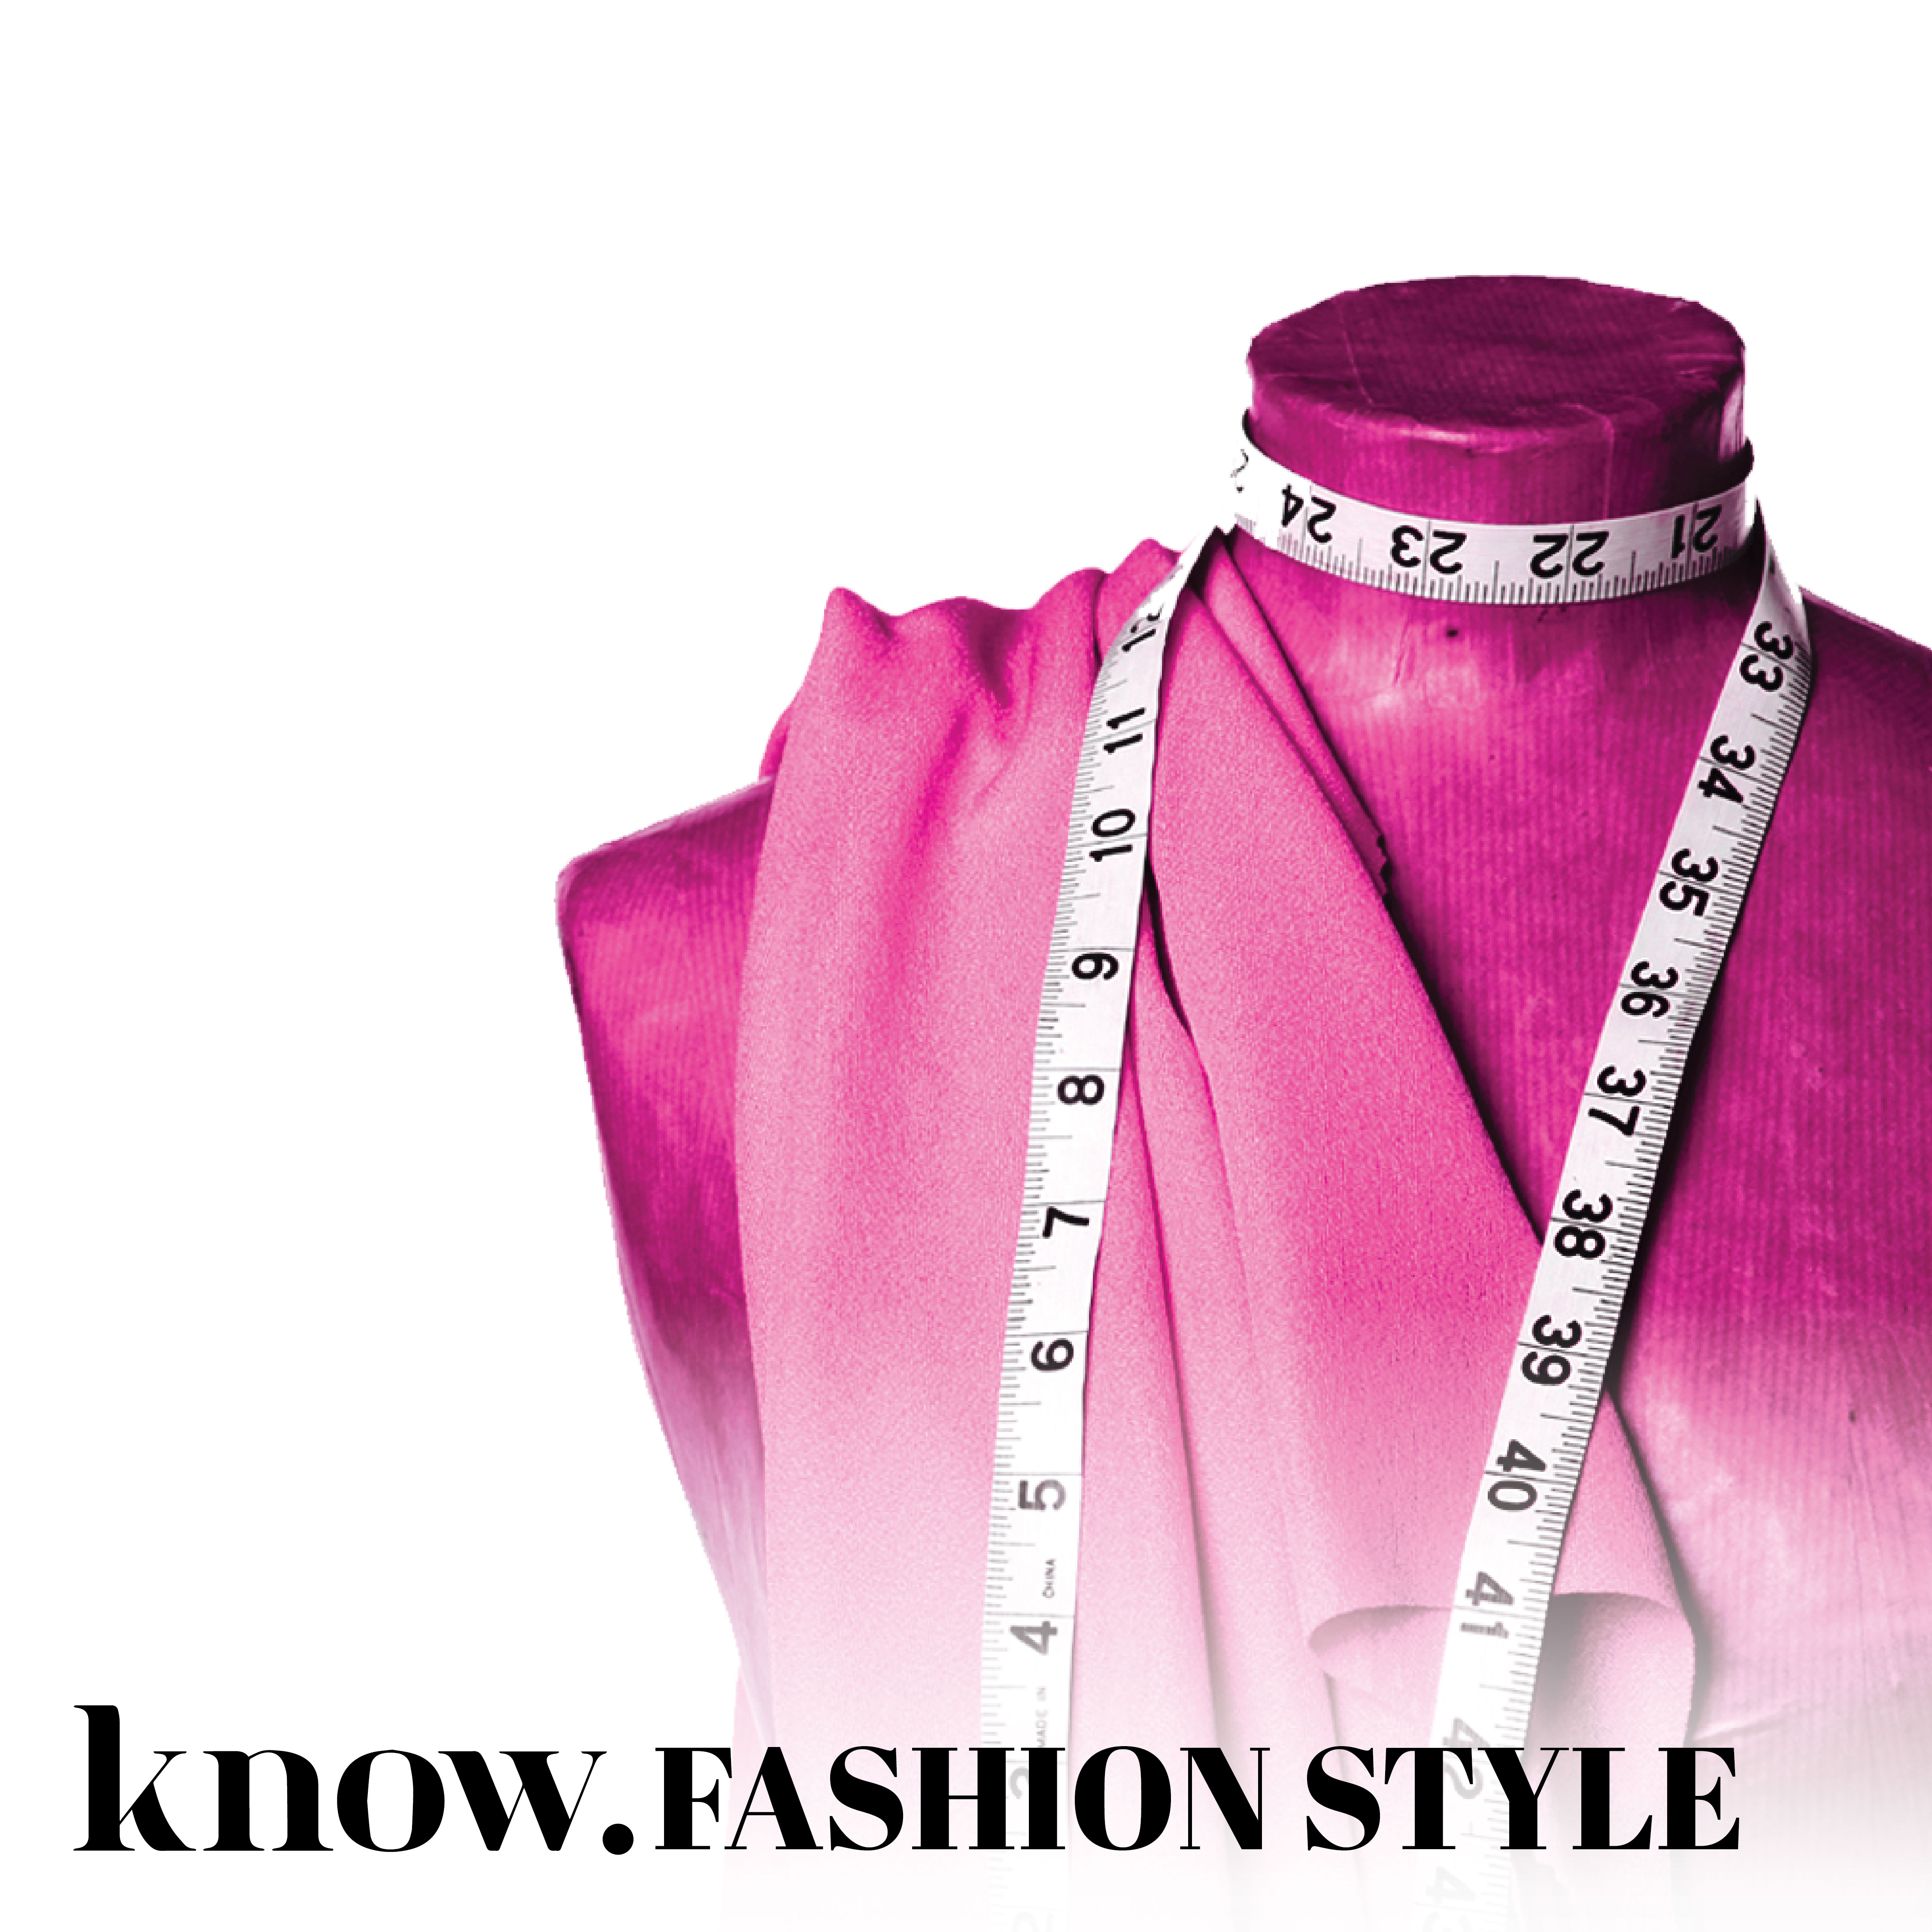 know_fashion masterclass post-new-4-04